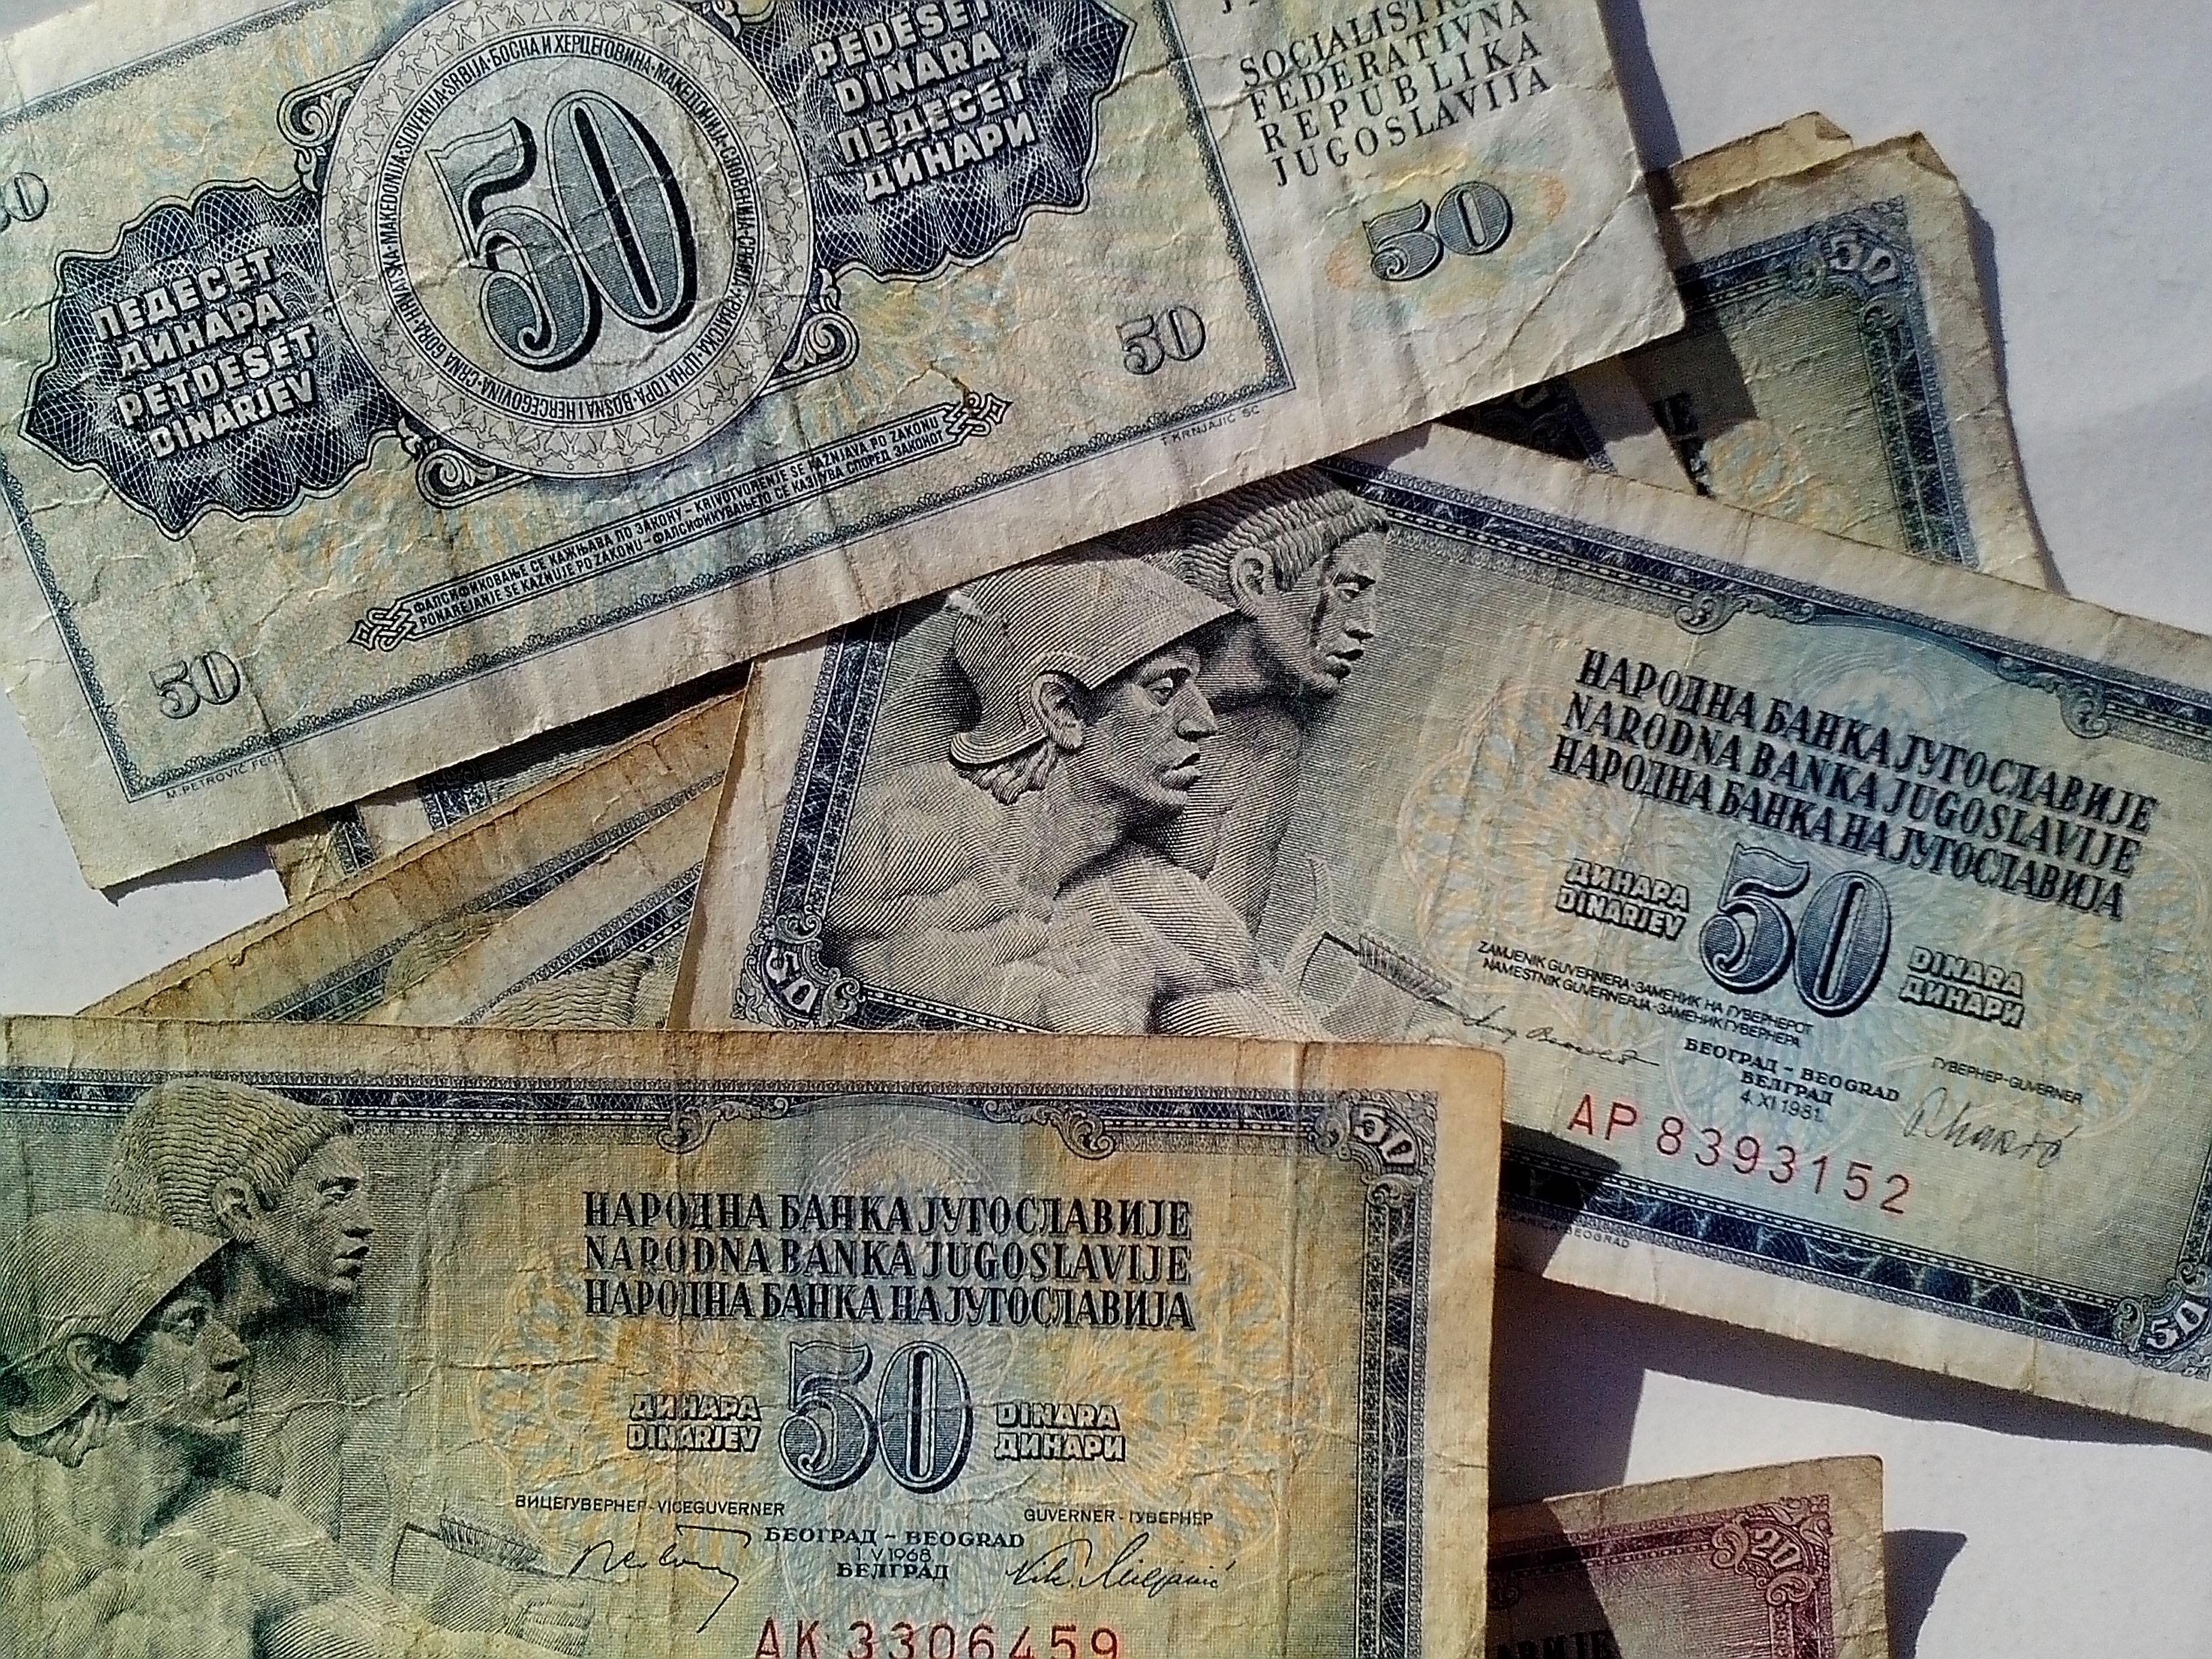 Free photograph; national, bank, Yugoslavia, banknotes, cash, currency